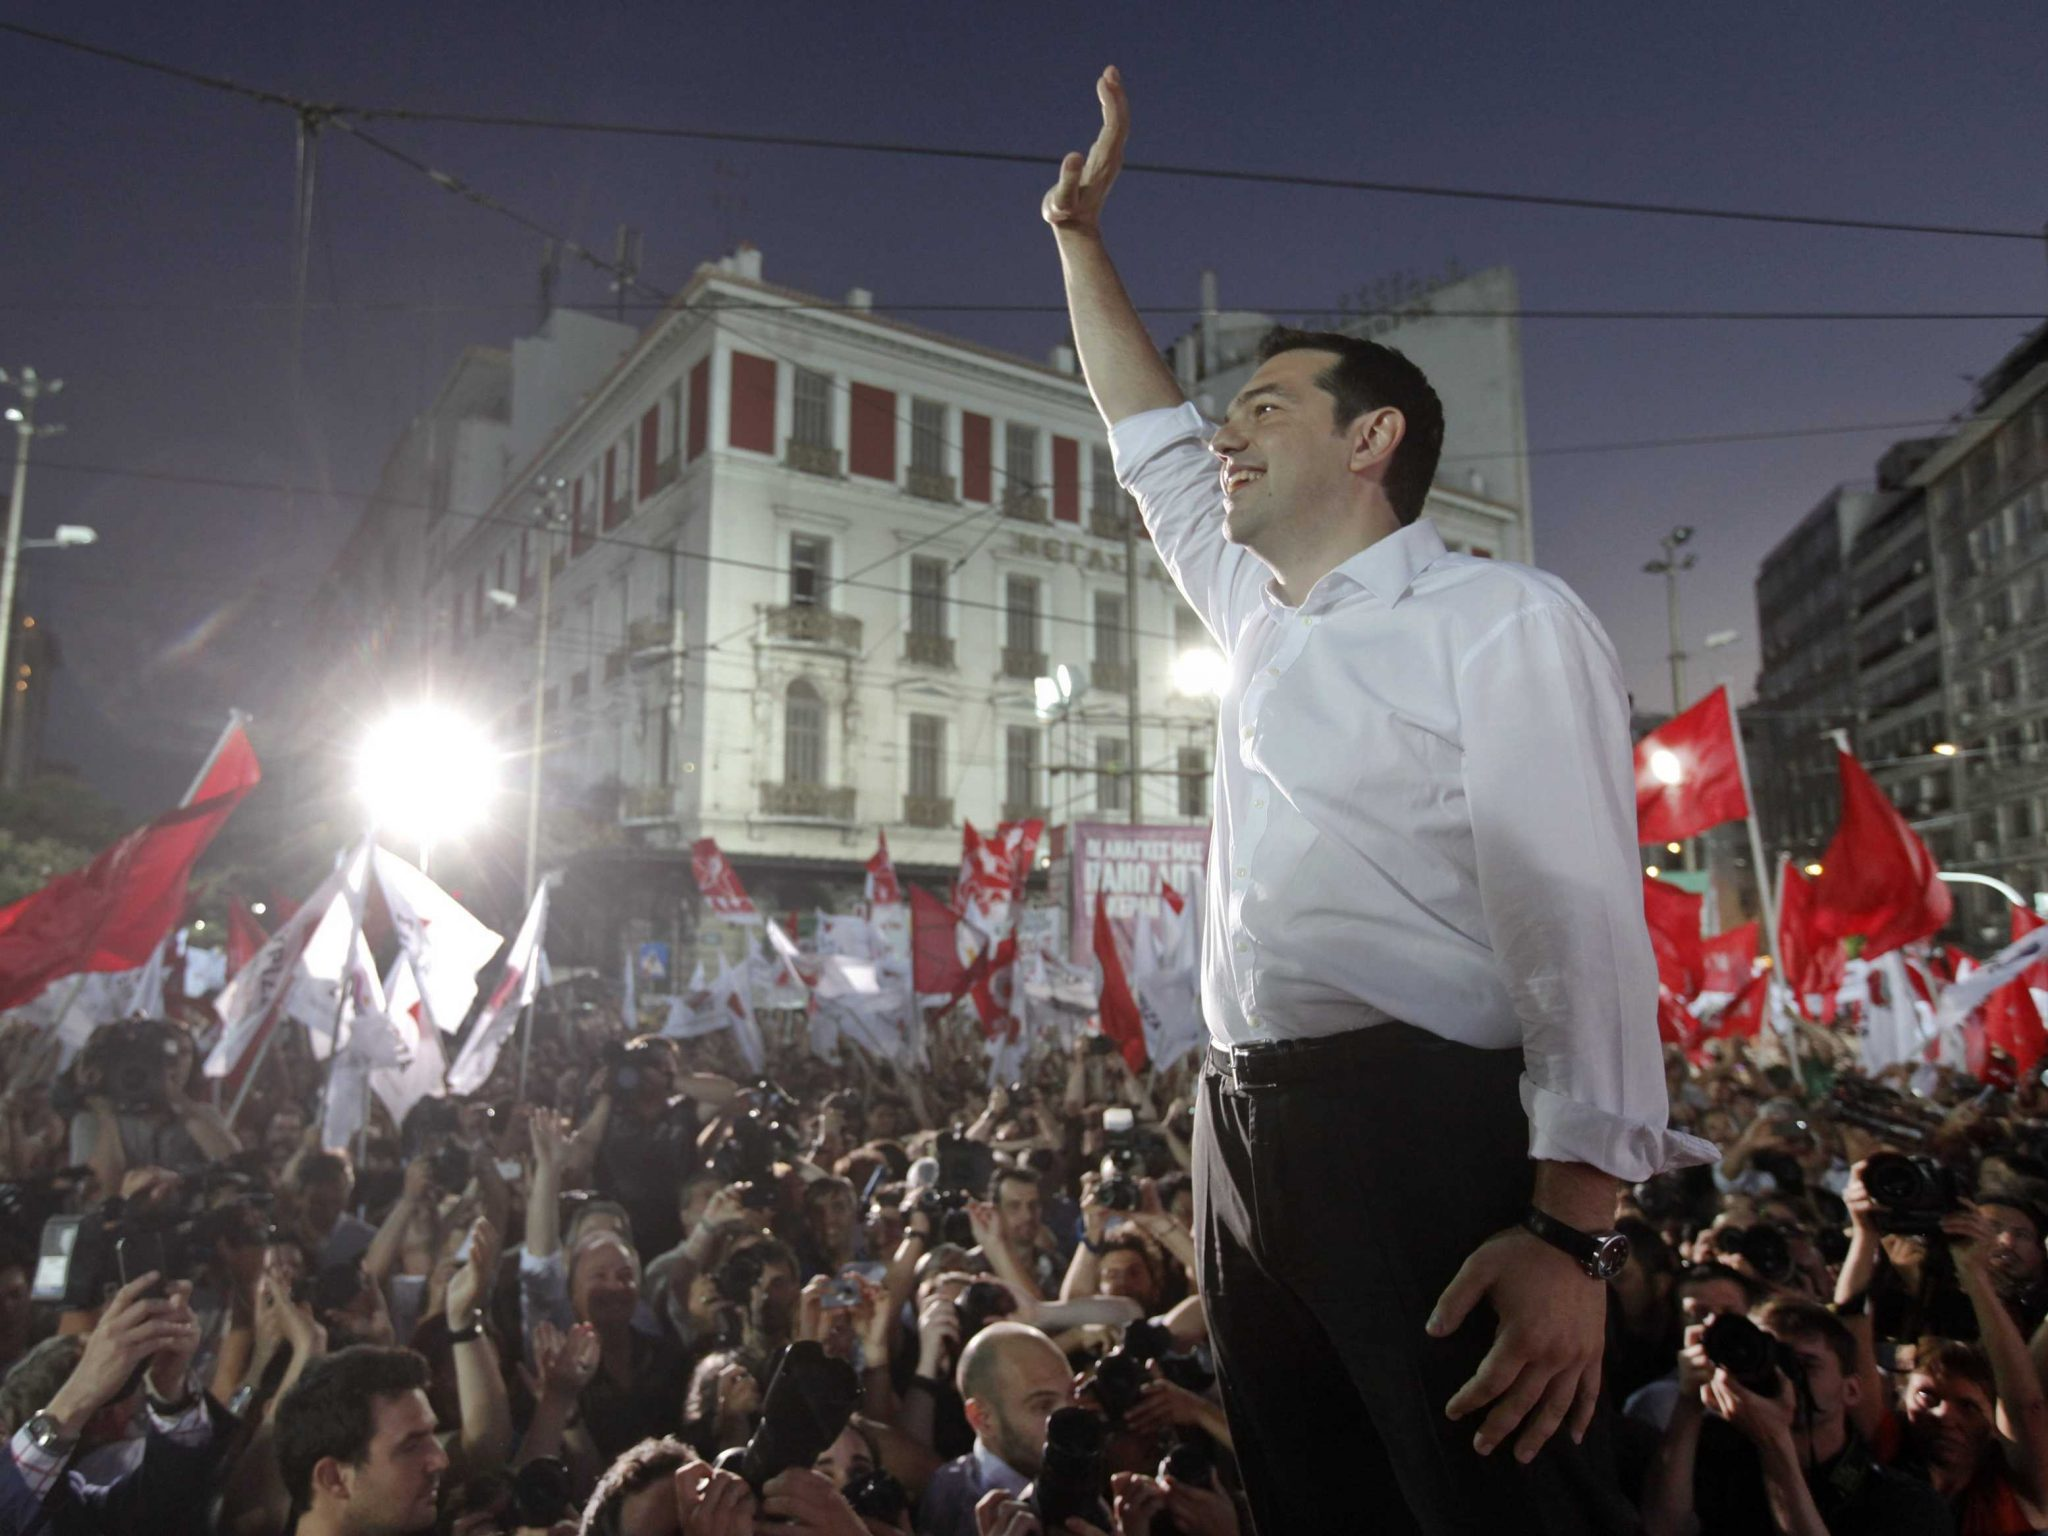 Photo of Καραμπινάτη κλοπή Δημοσίου Χρηματος απο το ΣΥΡΙΖΑ…..το δάνειο των 10 εκ.ευρω!!!